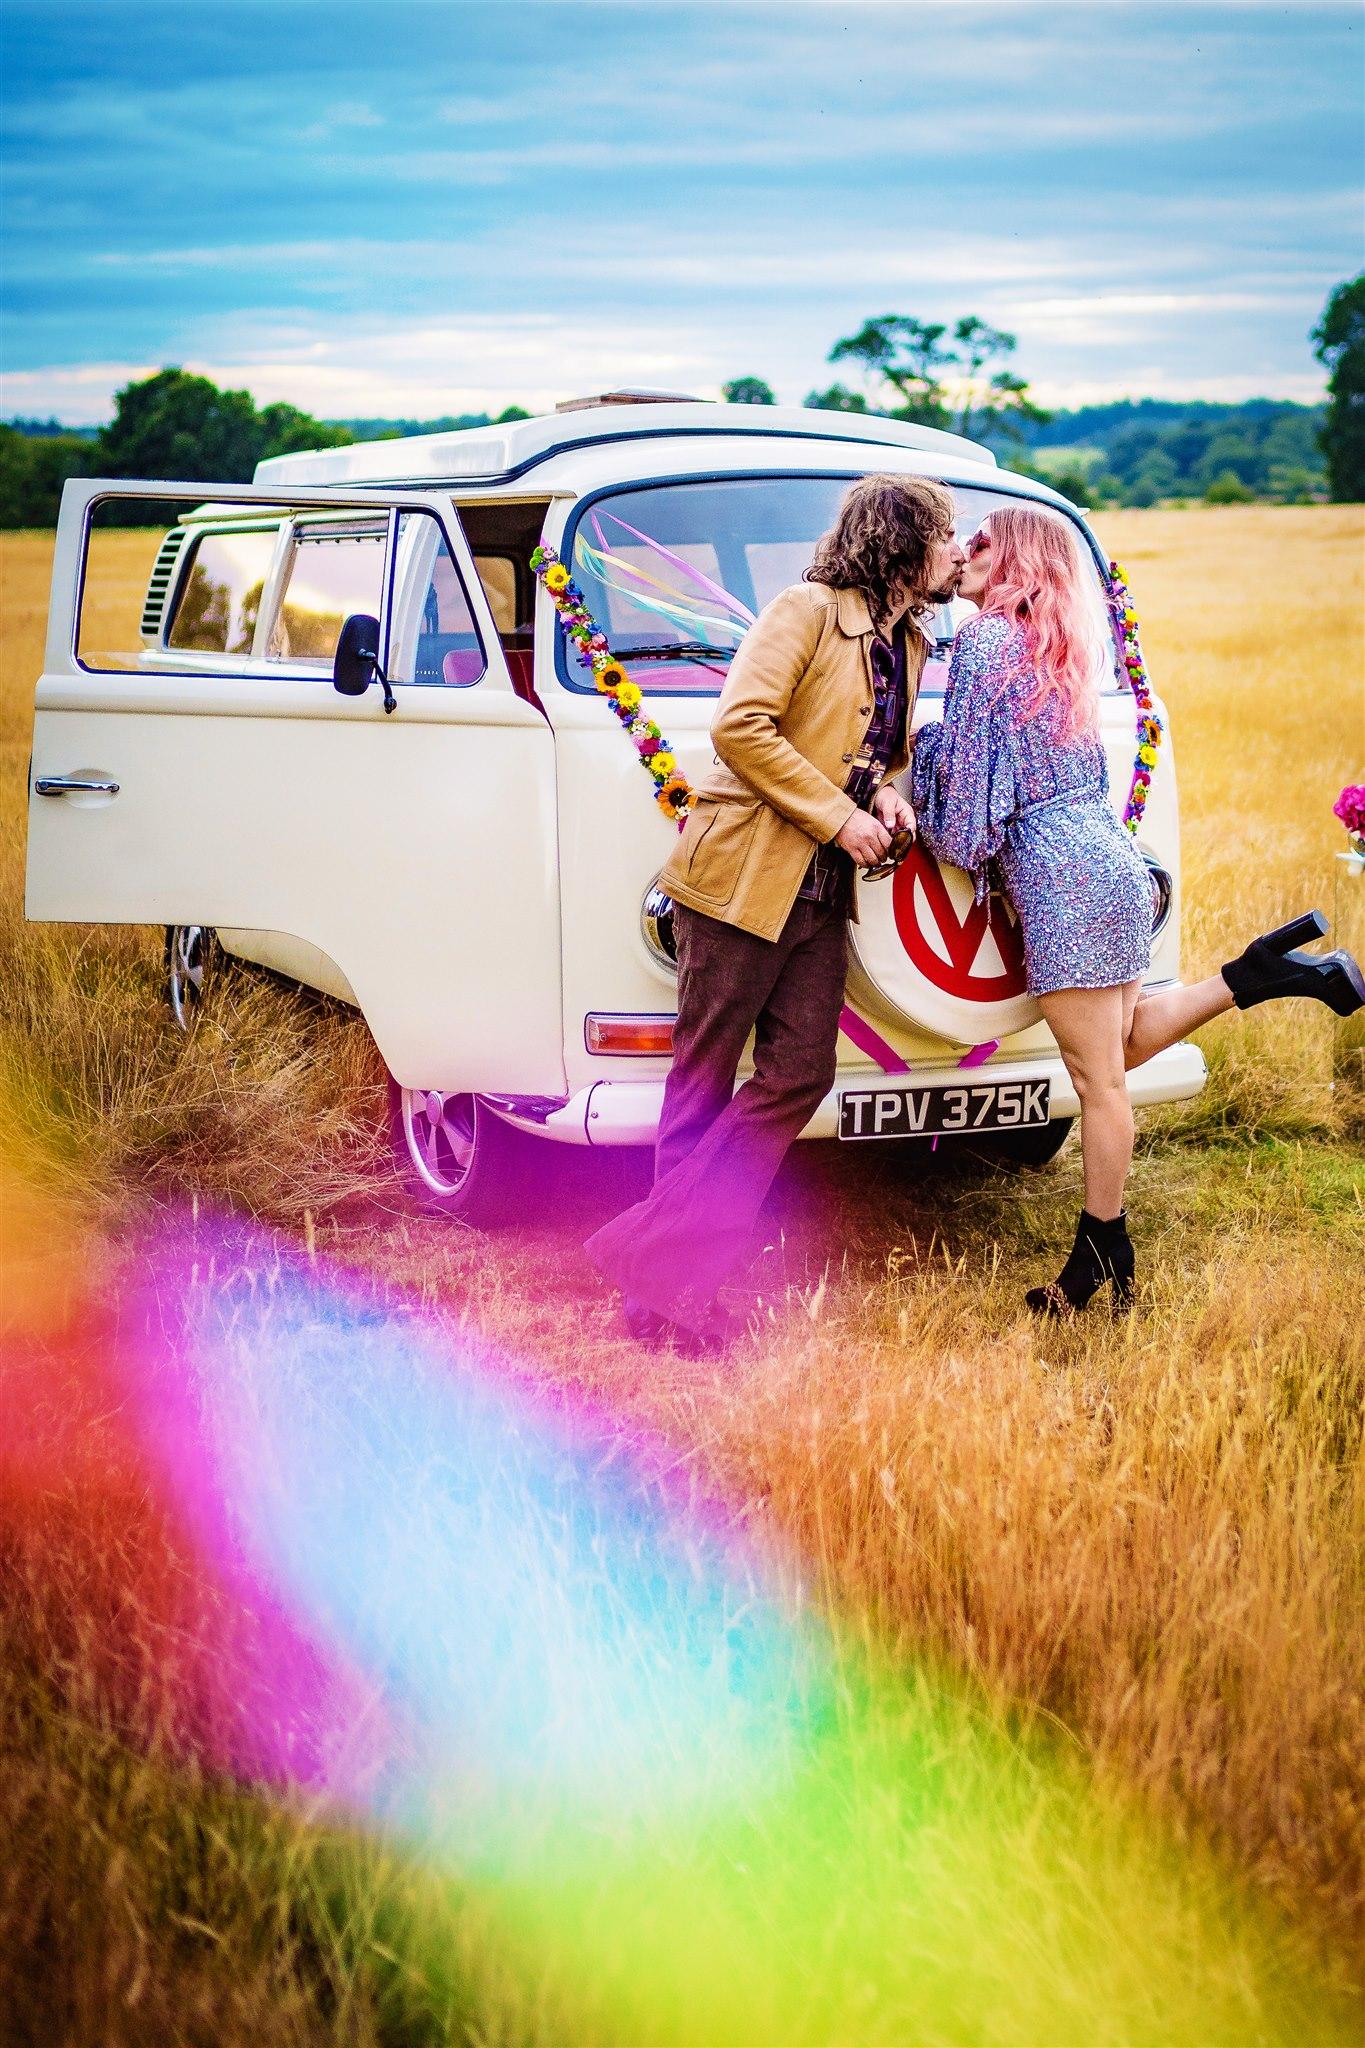 colourful bohemian wedding - 70s wedding - campervan wedding - hippie wedding